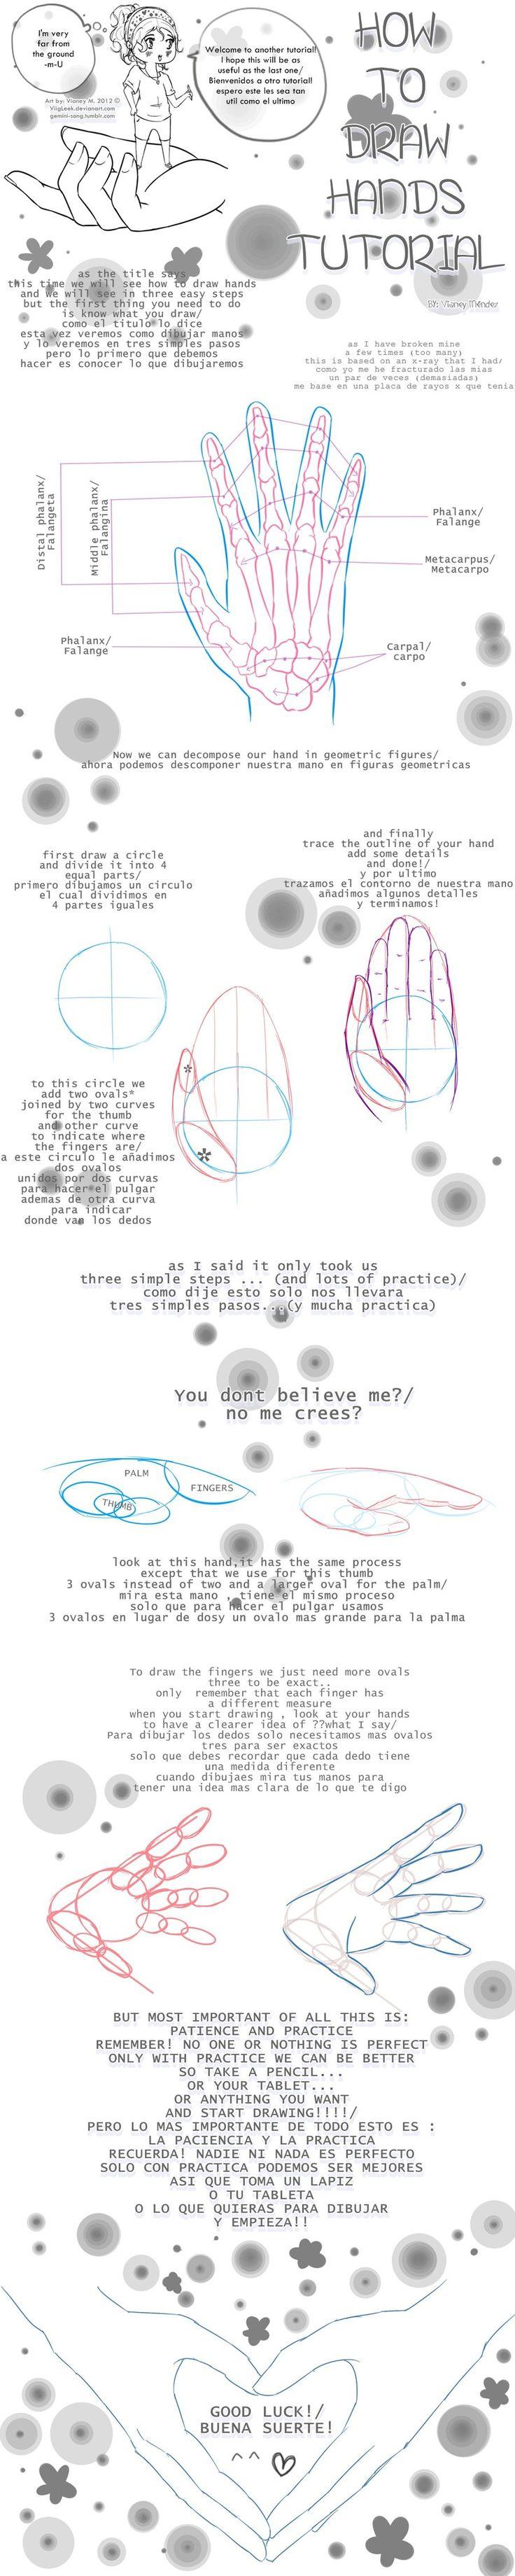 49 best feynman images on pinterest richard feynman drawings tutorial how to draw hands by bipolar gemini on deviantart pooptronica